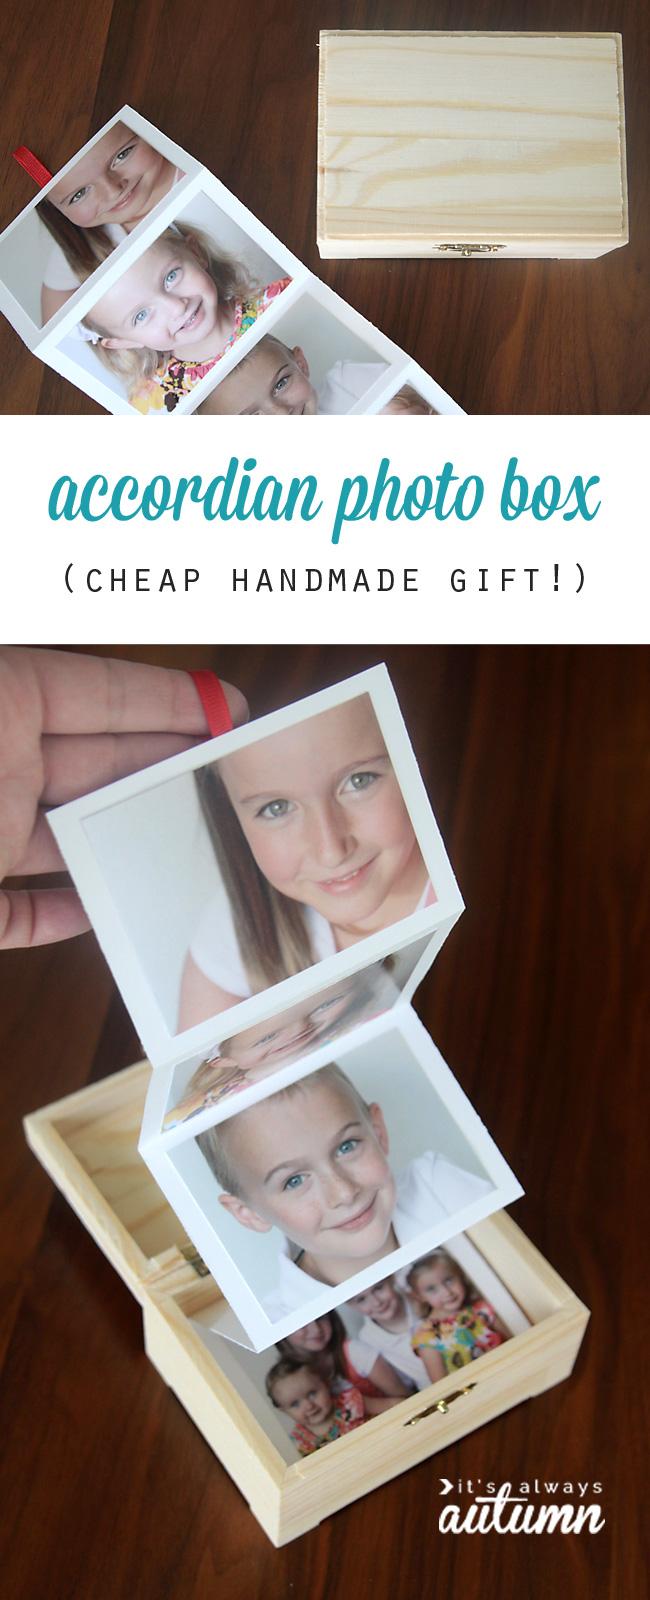 photo-gift-box-diy-handmade-present-christmas-gift-idea-easy-cheap-5